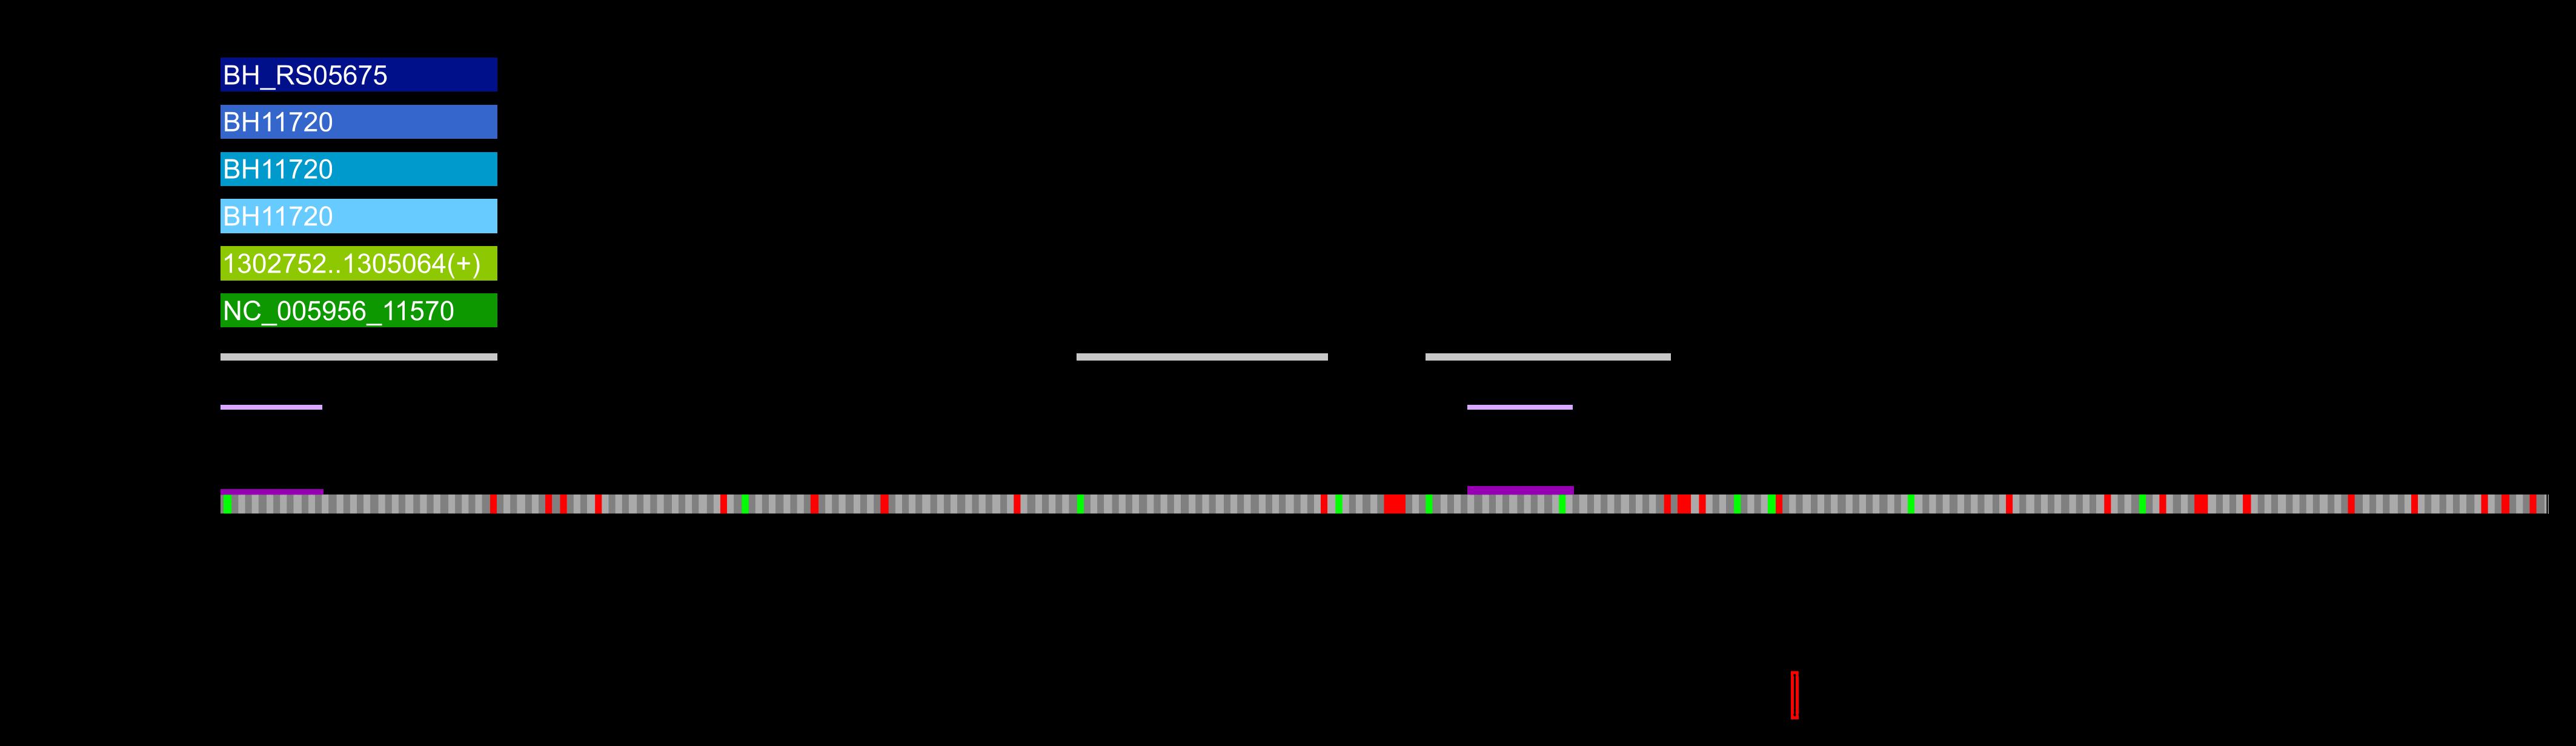 Integrated Proteogenomics Database